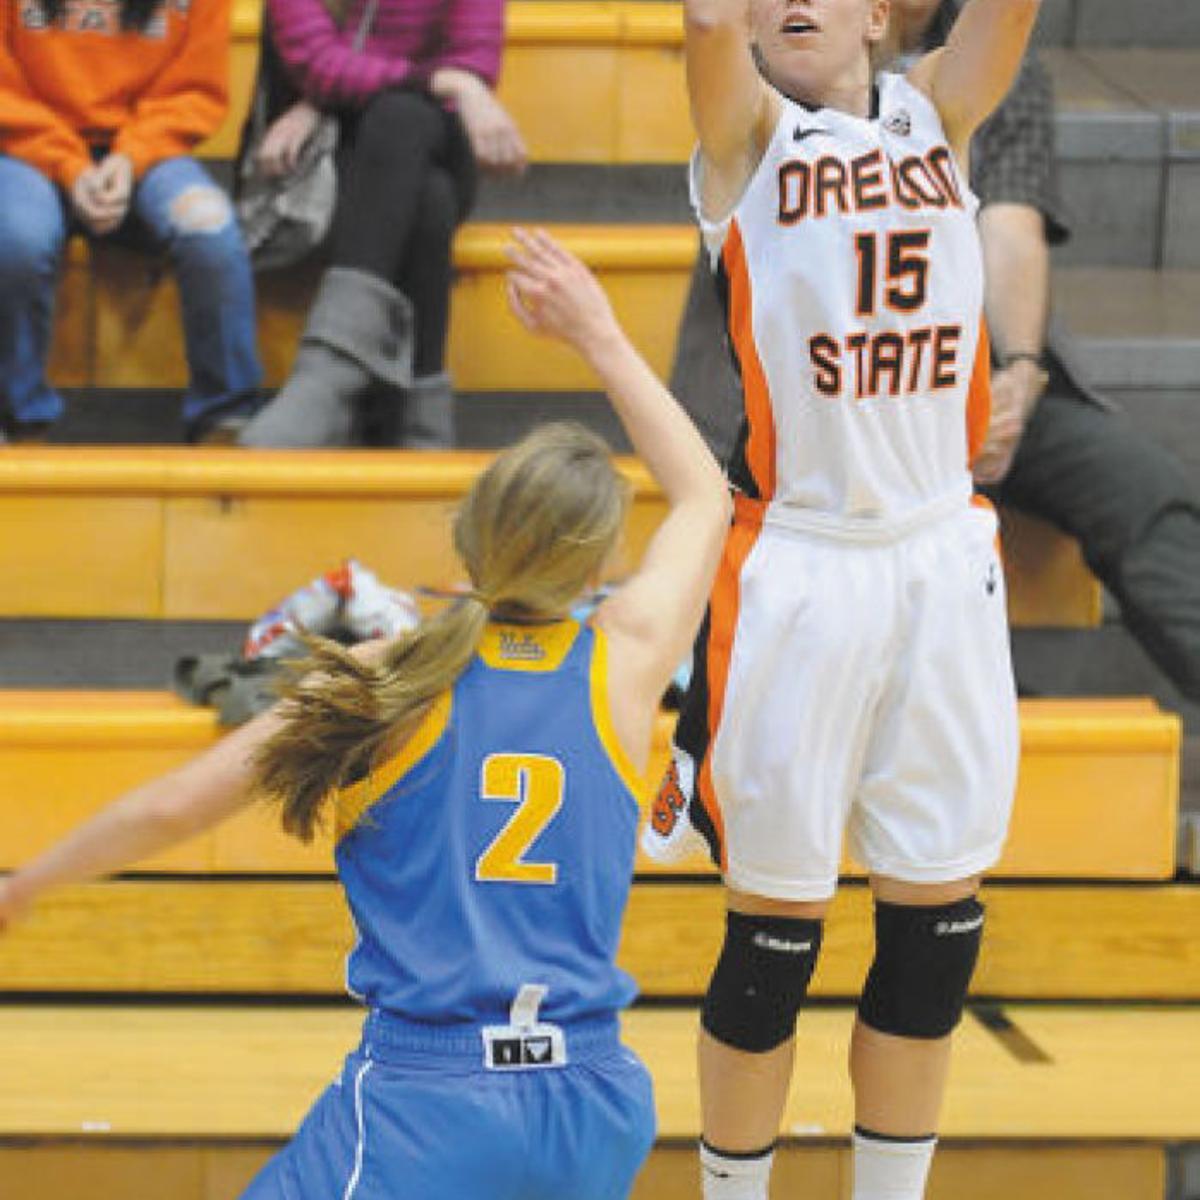 OSU women's basketball: Beavers want to finish road stretch